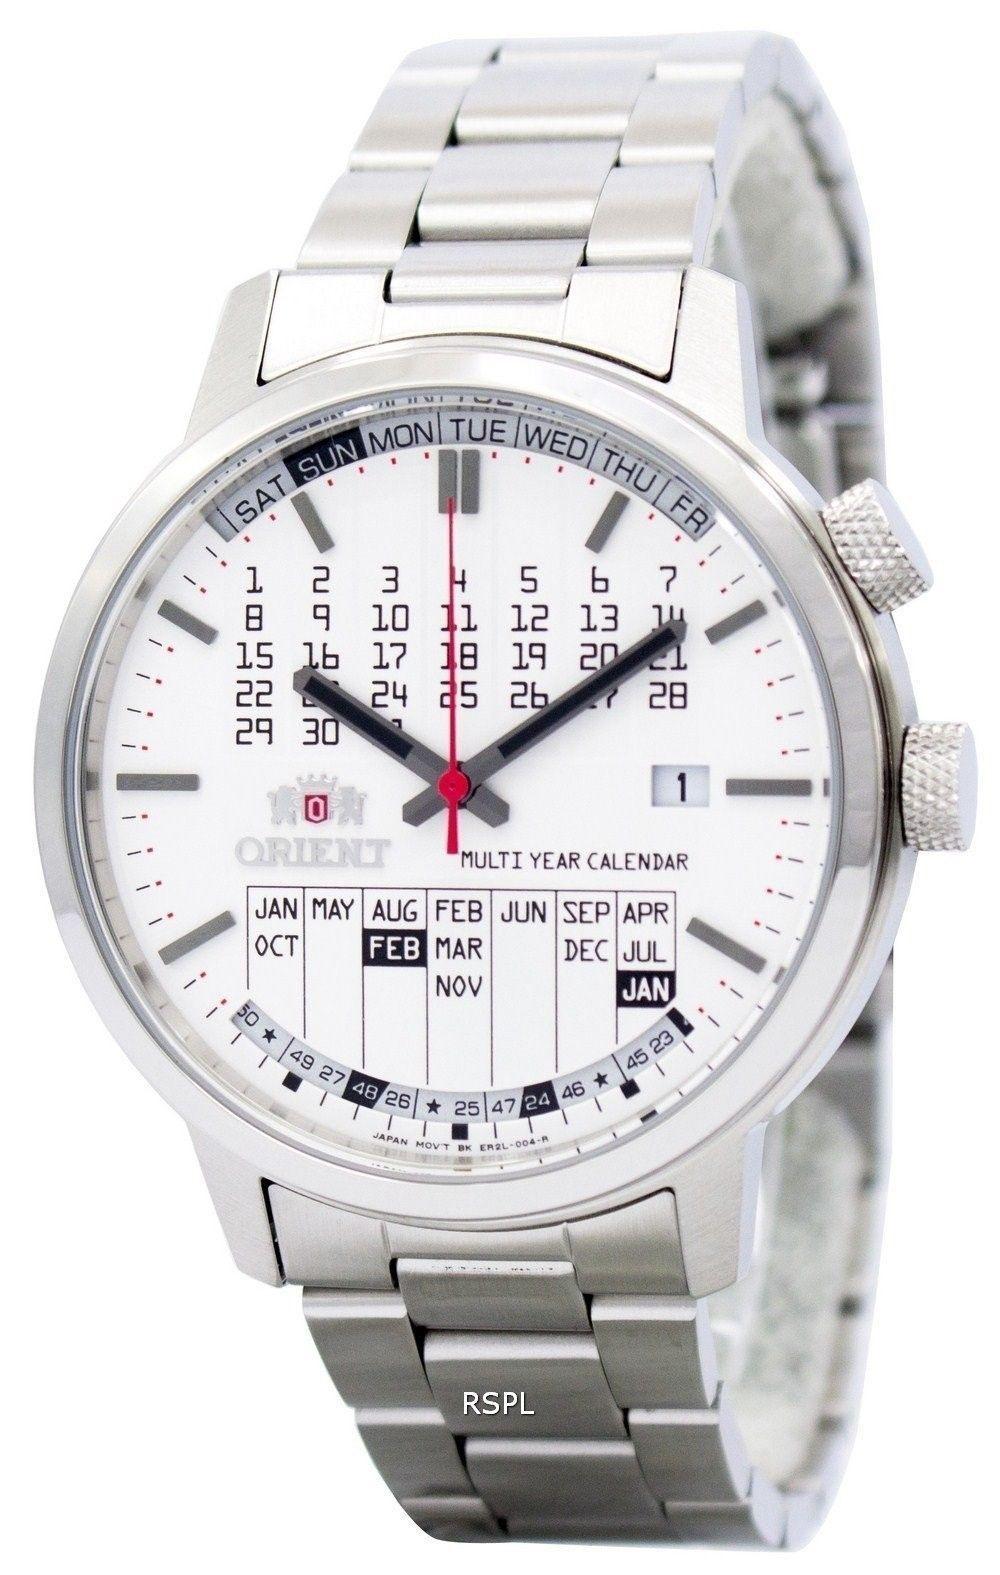 Orient Stylish And Smart Multi-Year Calendar Er2L004W Mens